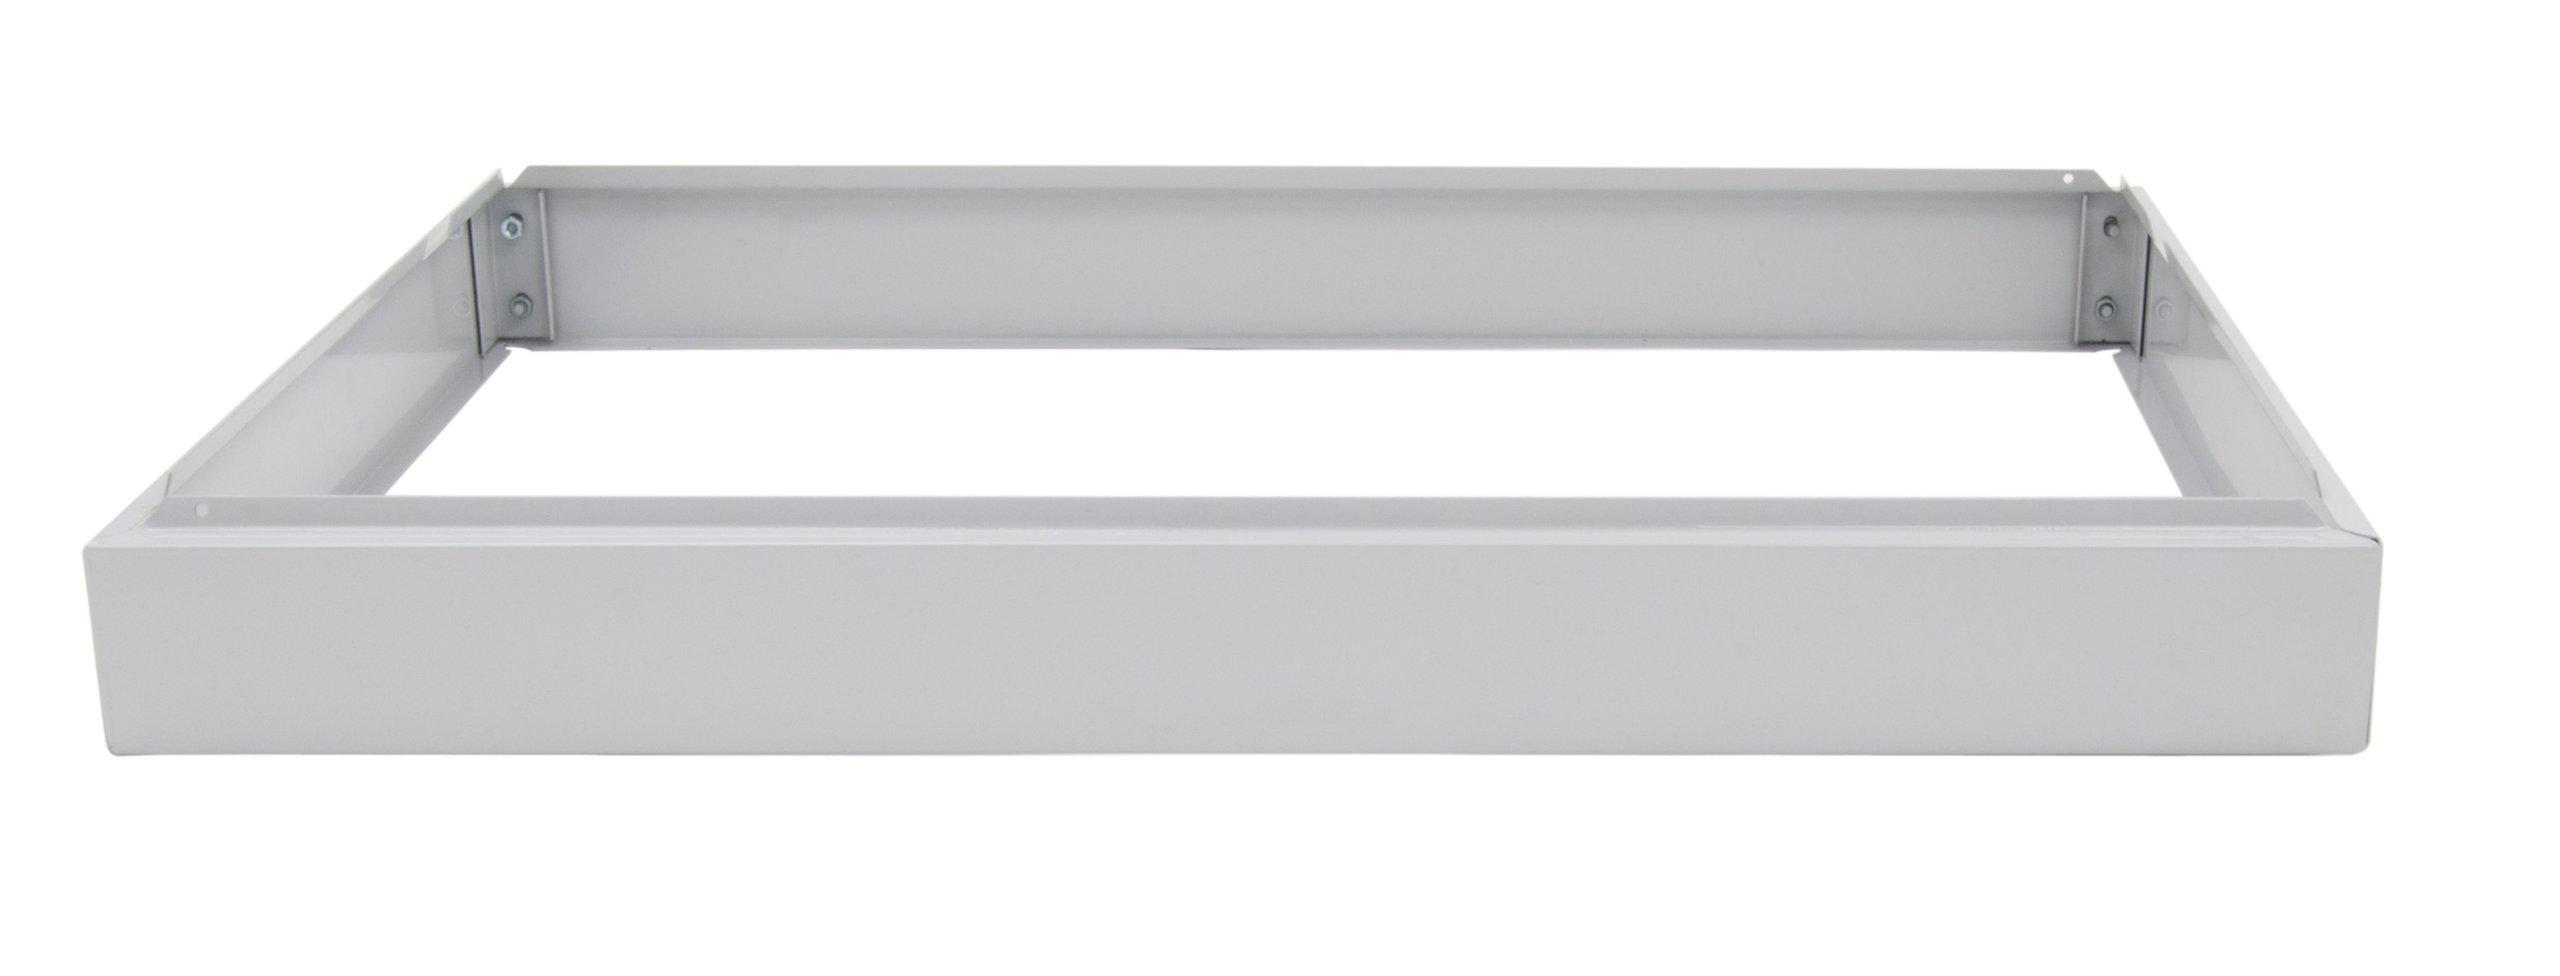 Studio Designs Flat File Riser in Light Grey 40.75 inches wide by 28.5 inches deep 60725 by Studio Designs